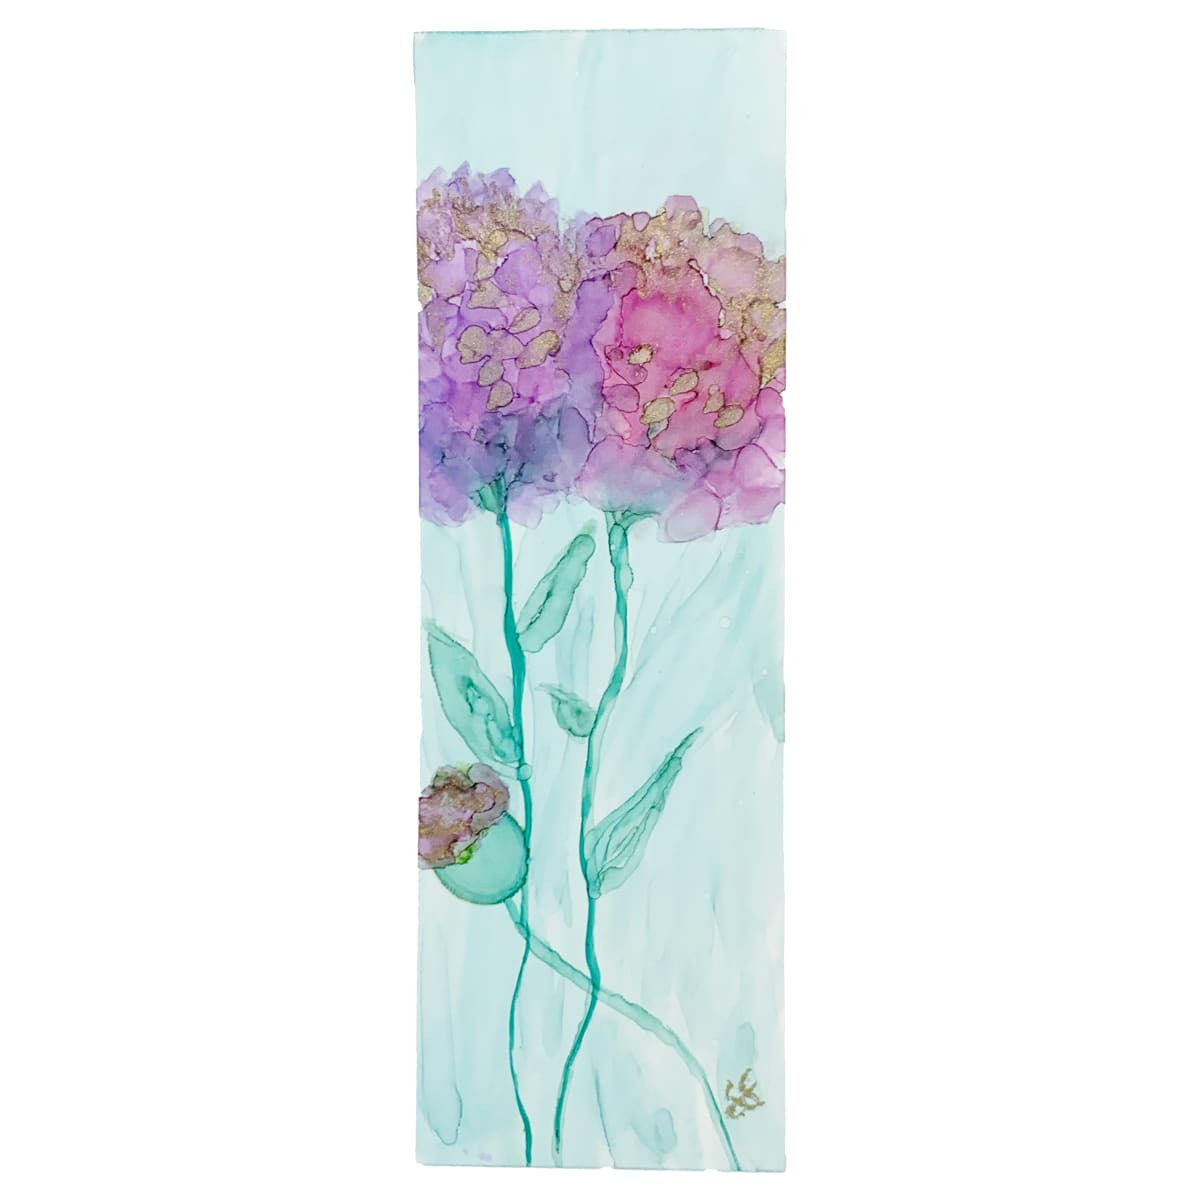 Alcohol Ink Bookmark - Hydrangeas #9 by Susi Schuele